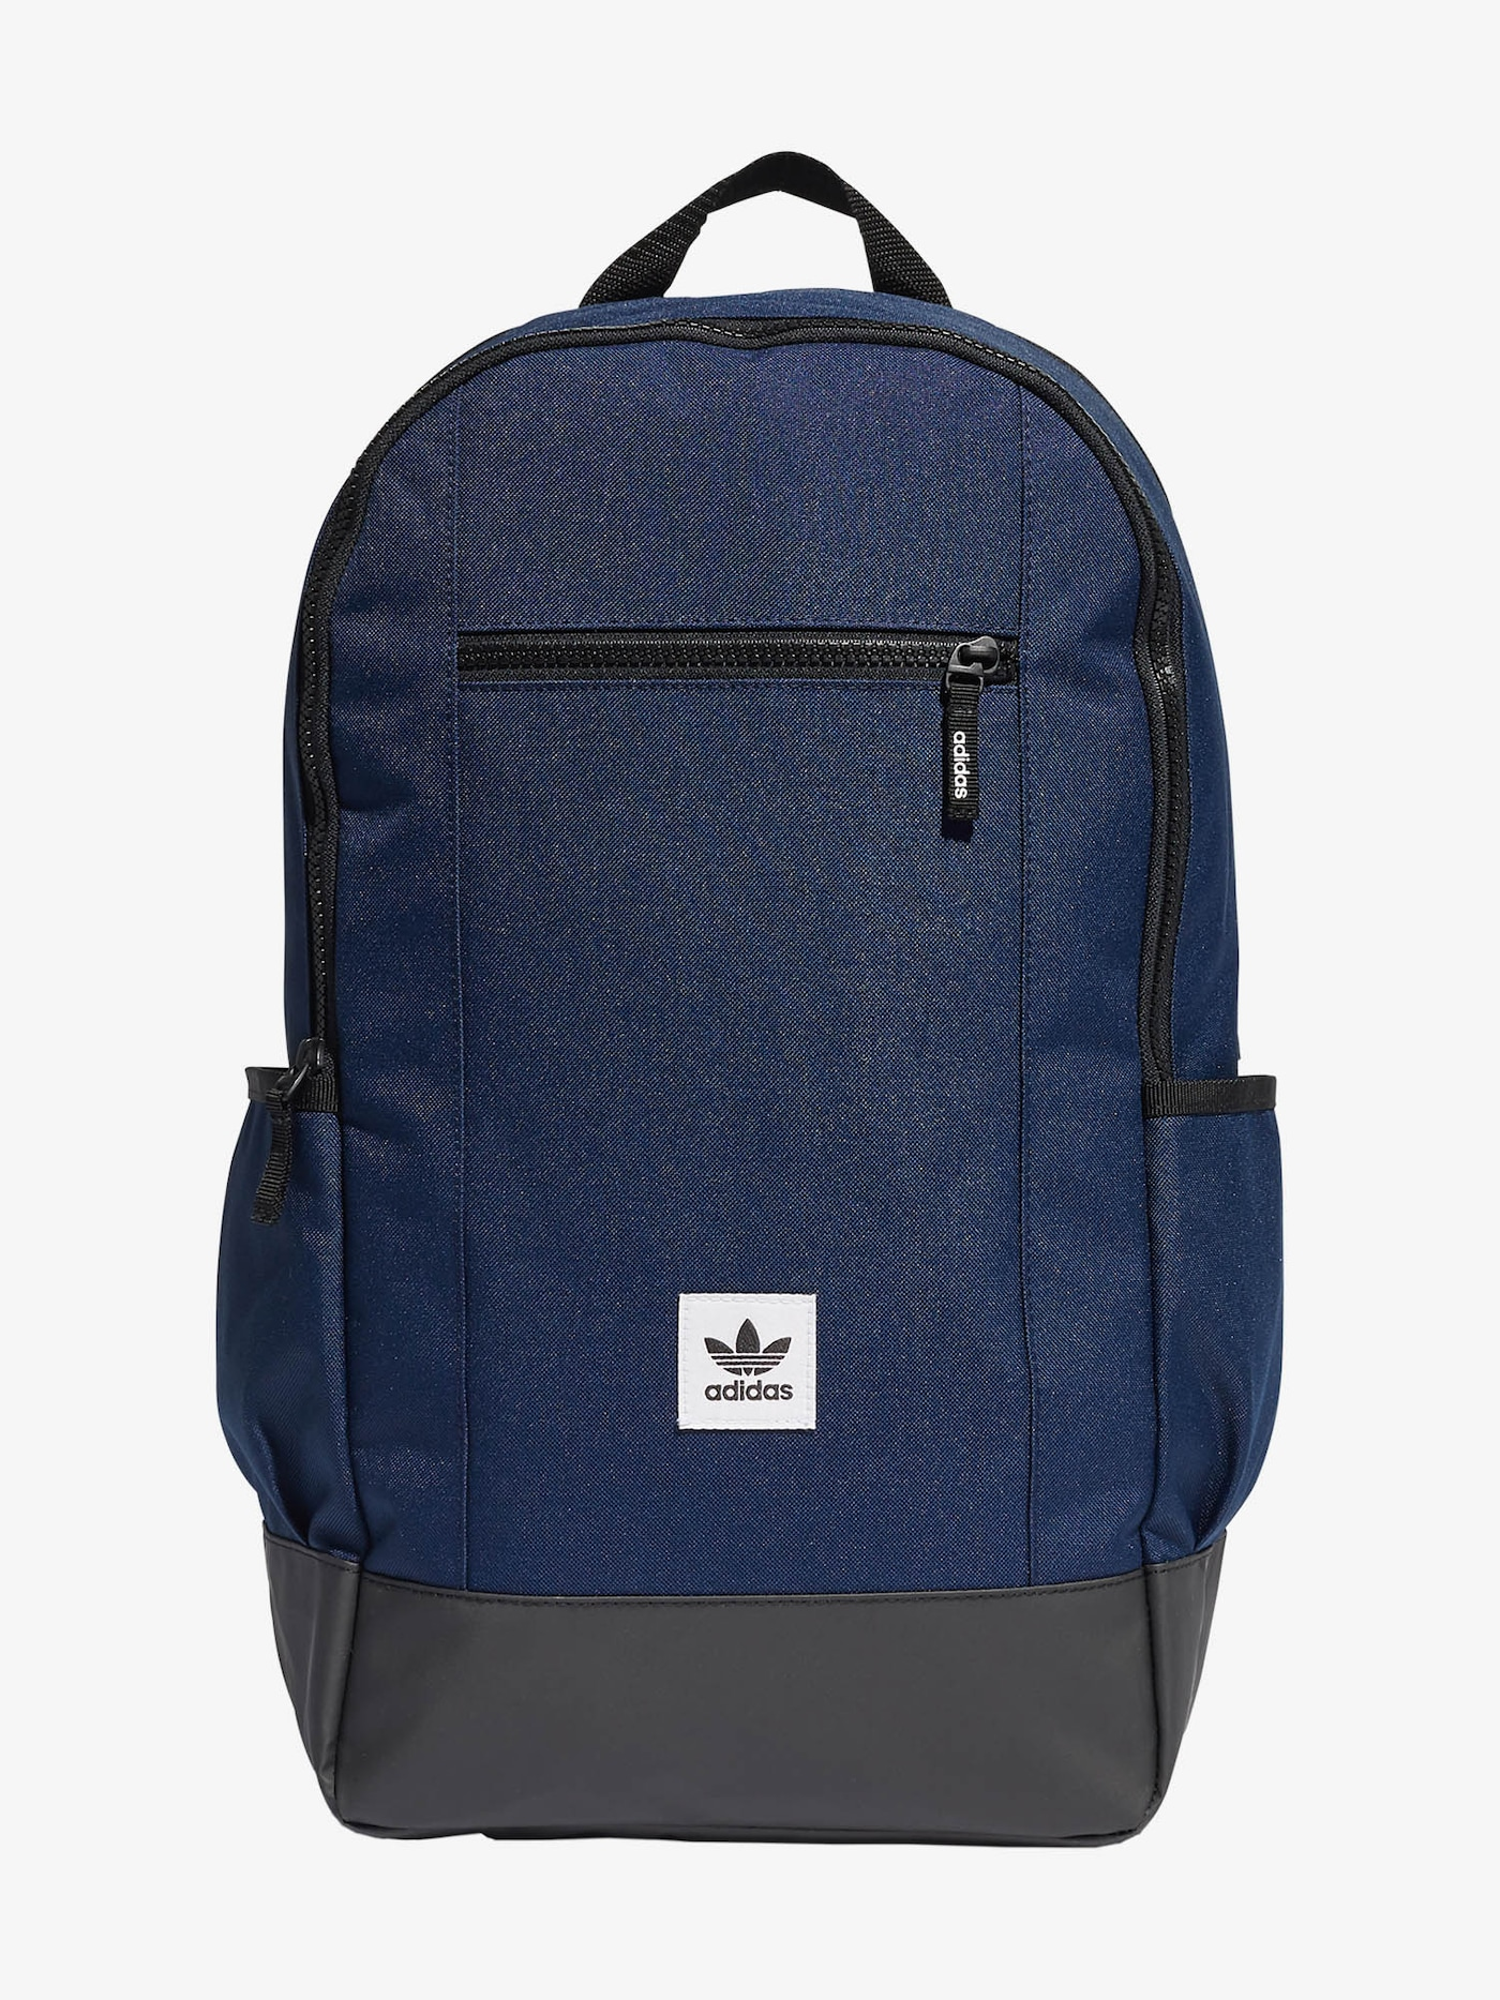 Adidas Originals Pe Modern Bp Backpack